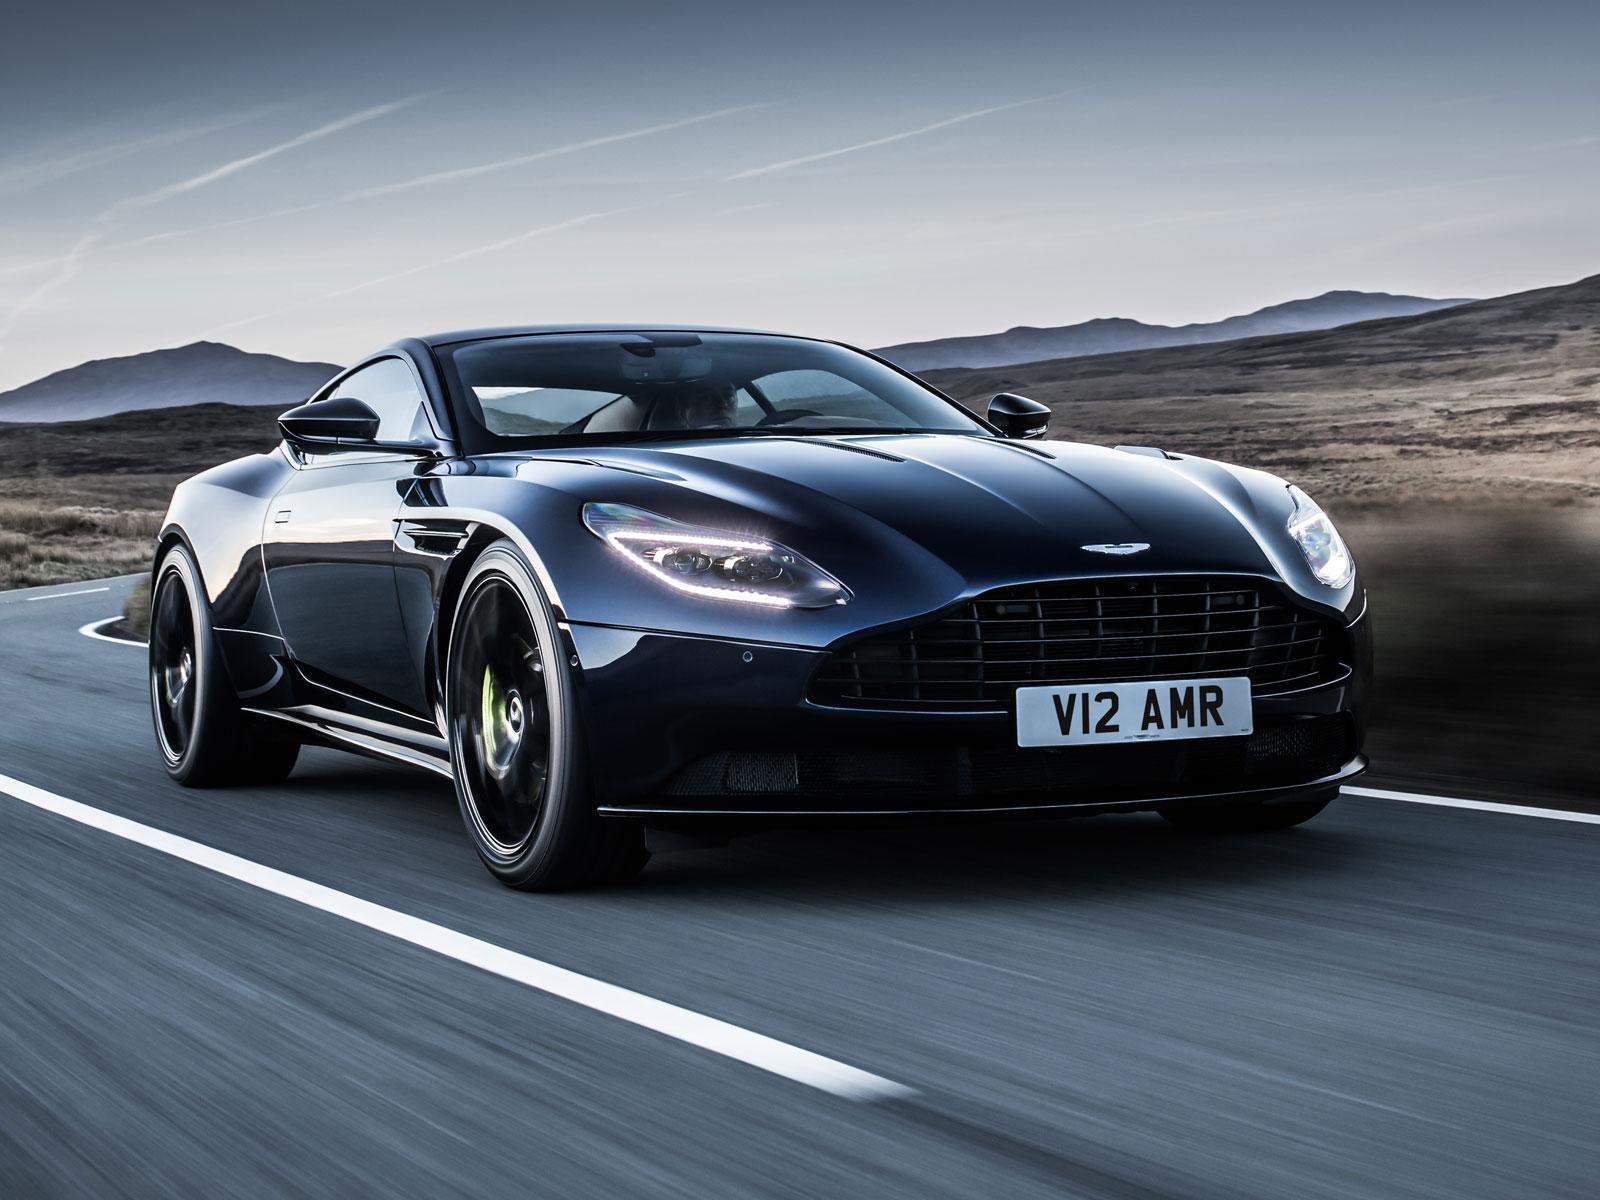 Aston Martin Db11 Amr Mariana Blue Designer Specification Car Body Design